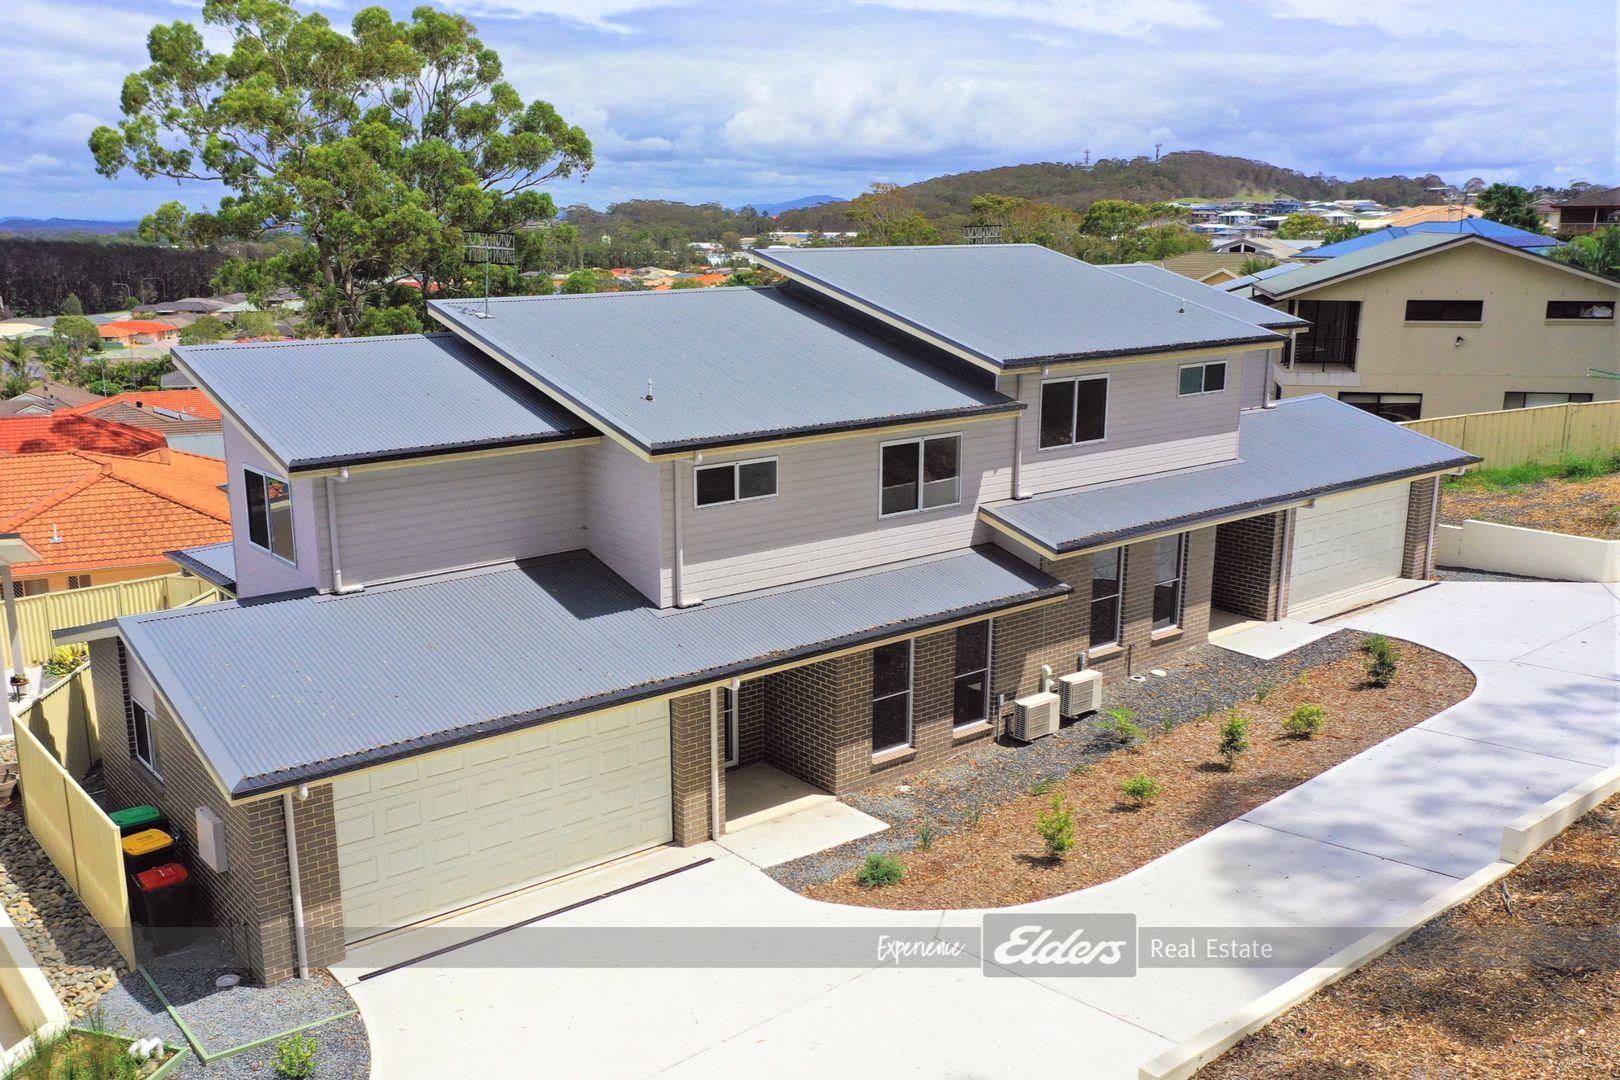 2/11 Oriana Close, Forster NSW 2428, Image 0